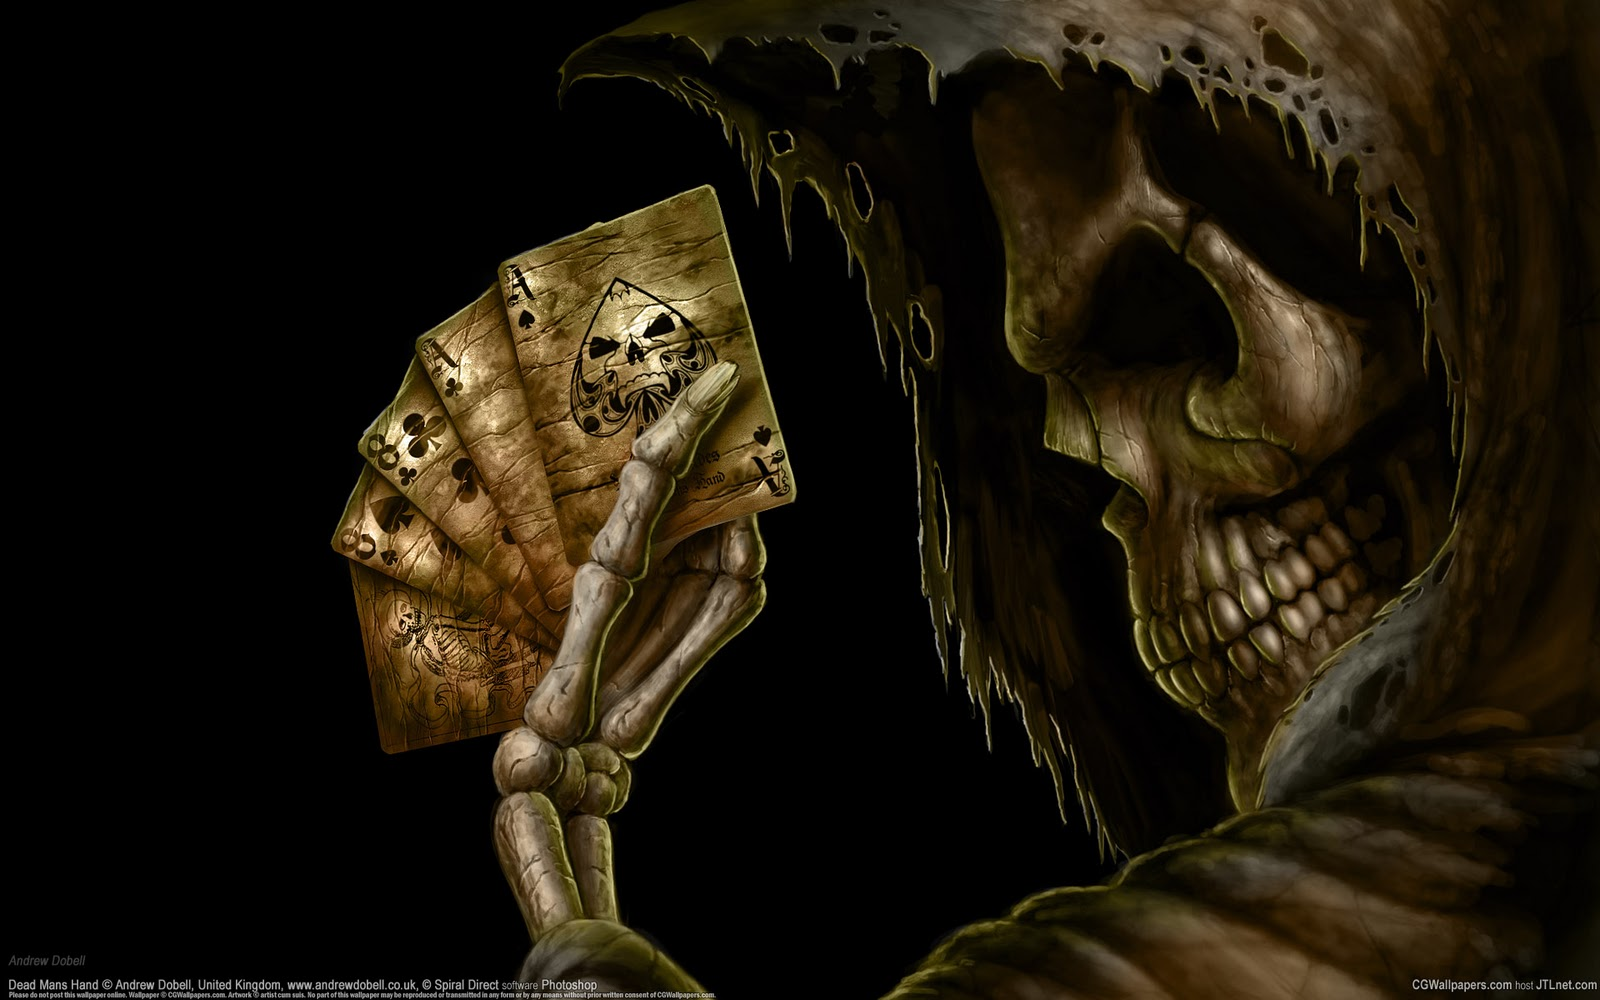 http://4.bp.blogspot.com/_IX-VUYLhK1Y/TNL24Gw6hsI/AAAAAAAAAHg/YH7q7GMV40U/s1600/1288228914240.jpg